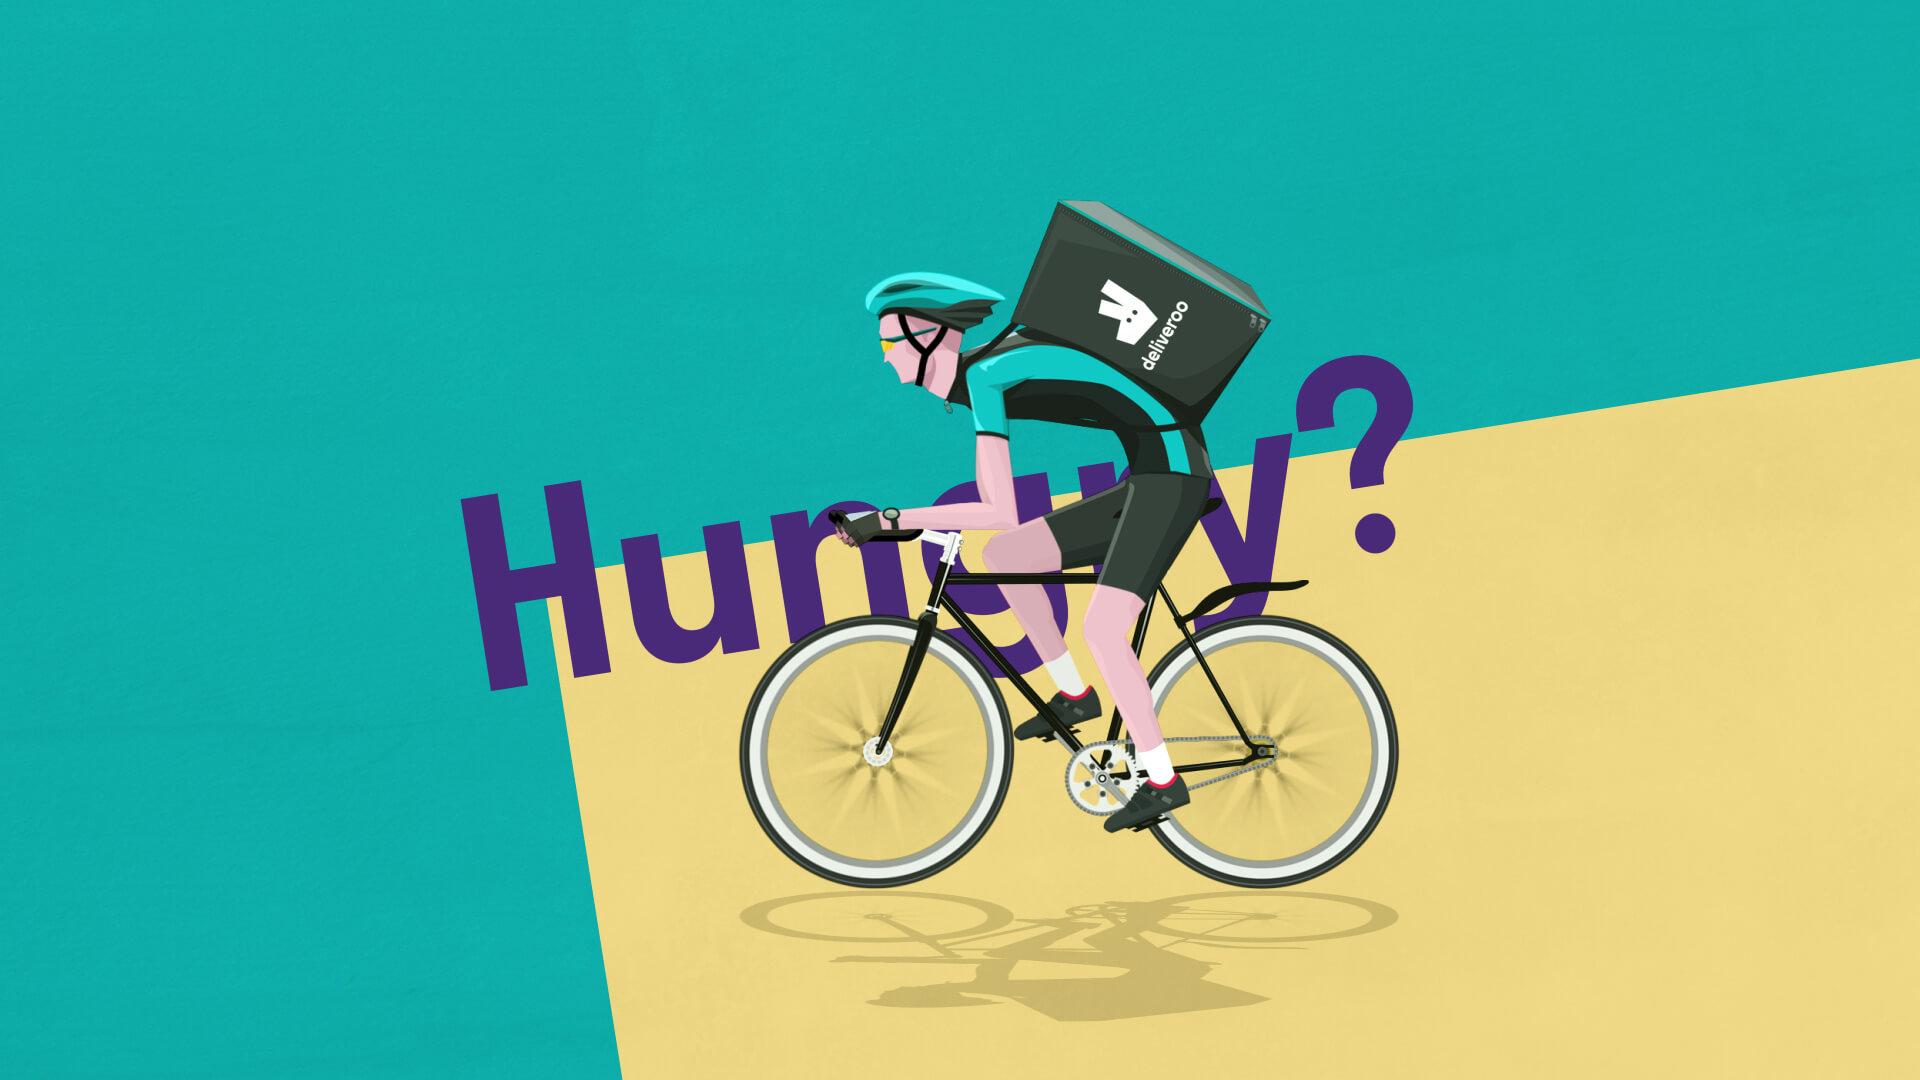 Feeling-hungry-Deliveroo-TILT-Amsterdam-Animation-image-1